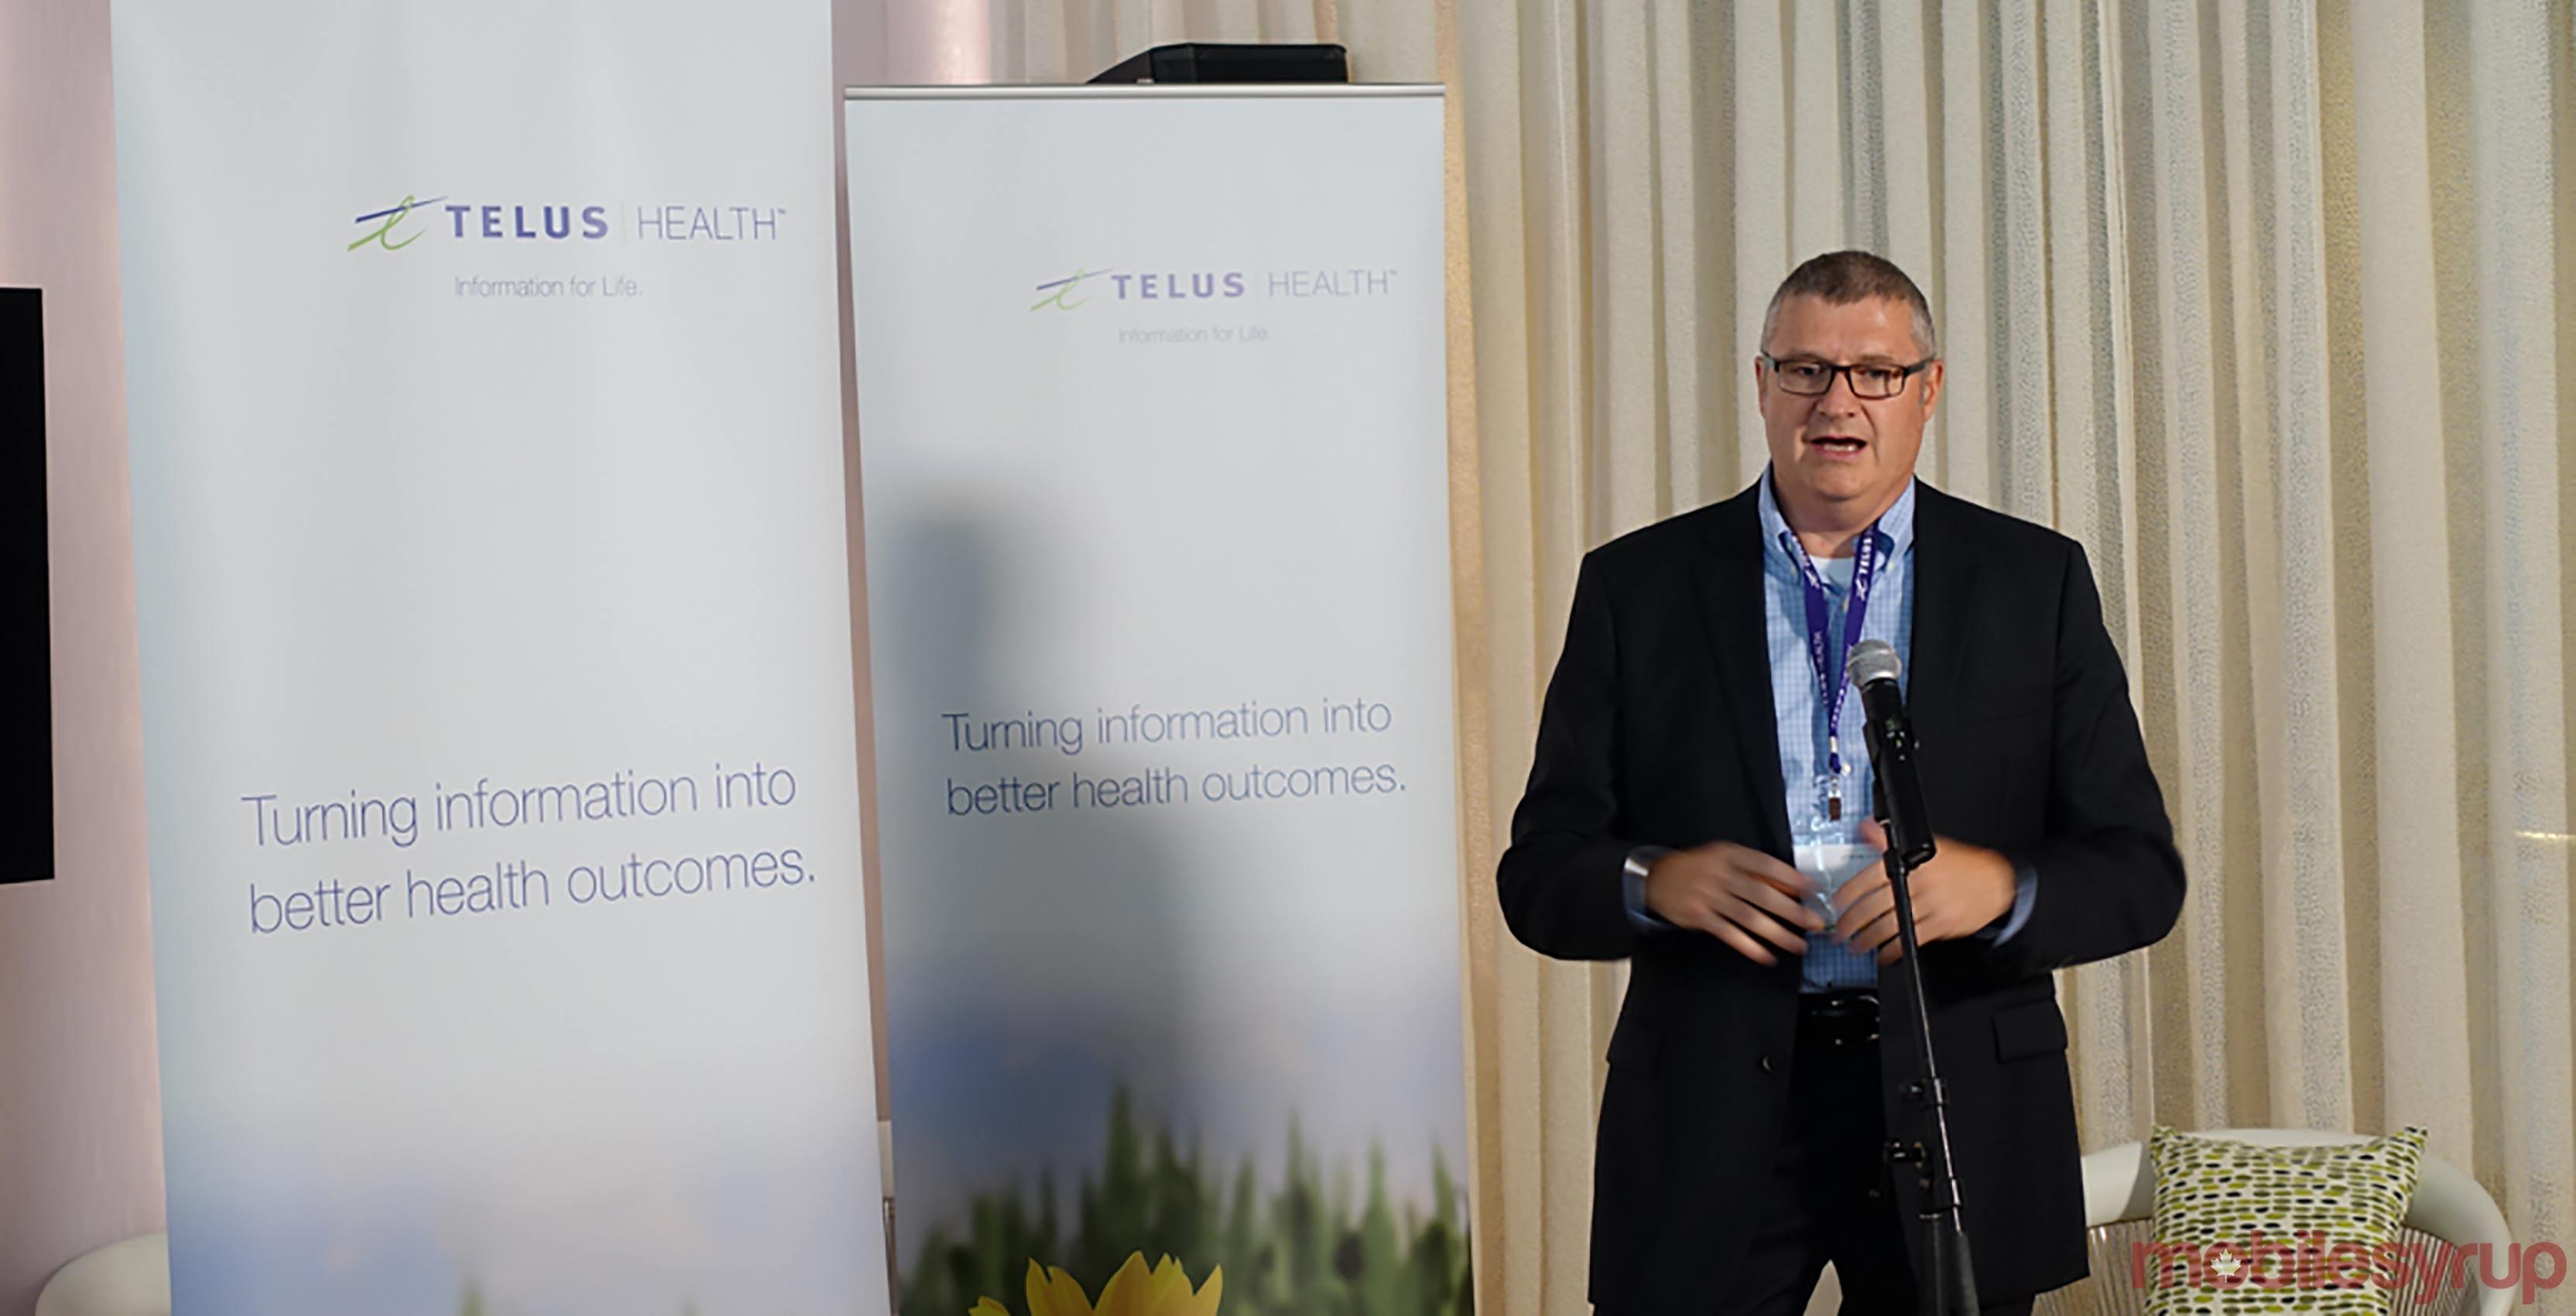 Paul Lepage, president of Telus Health